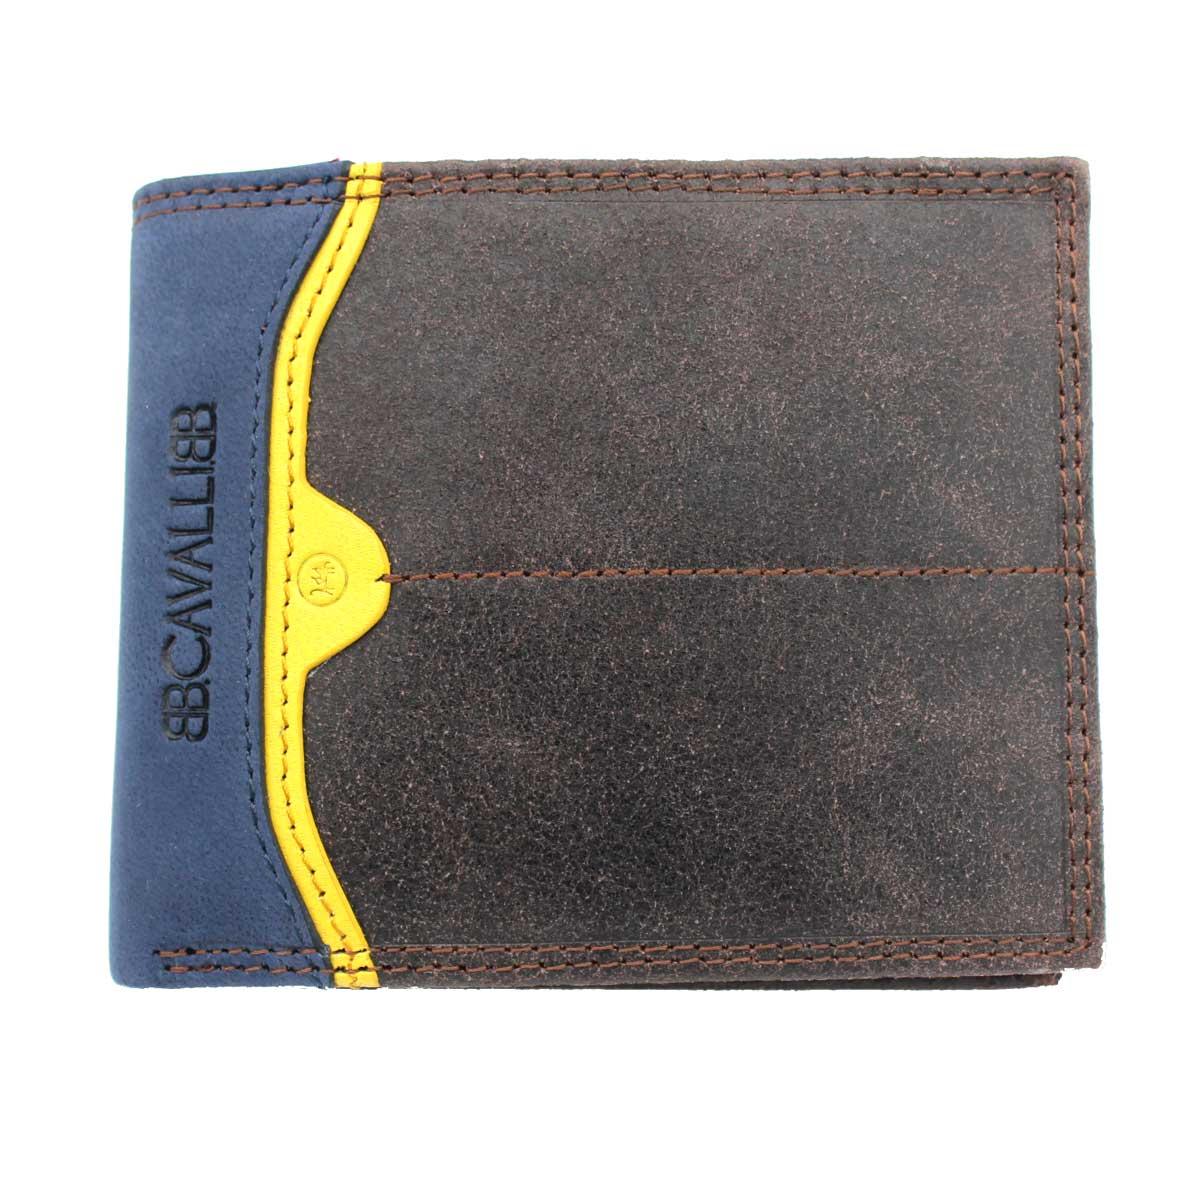 Pierre Cardin-Genuine Leather-Mens Black Brown Wallet-Card Coin Holder Purse+Box